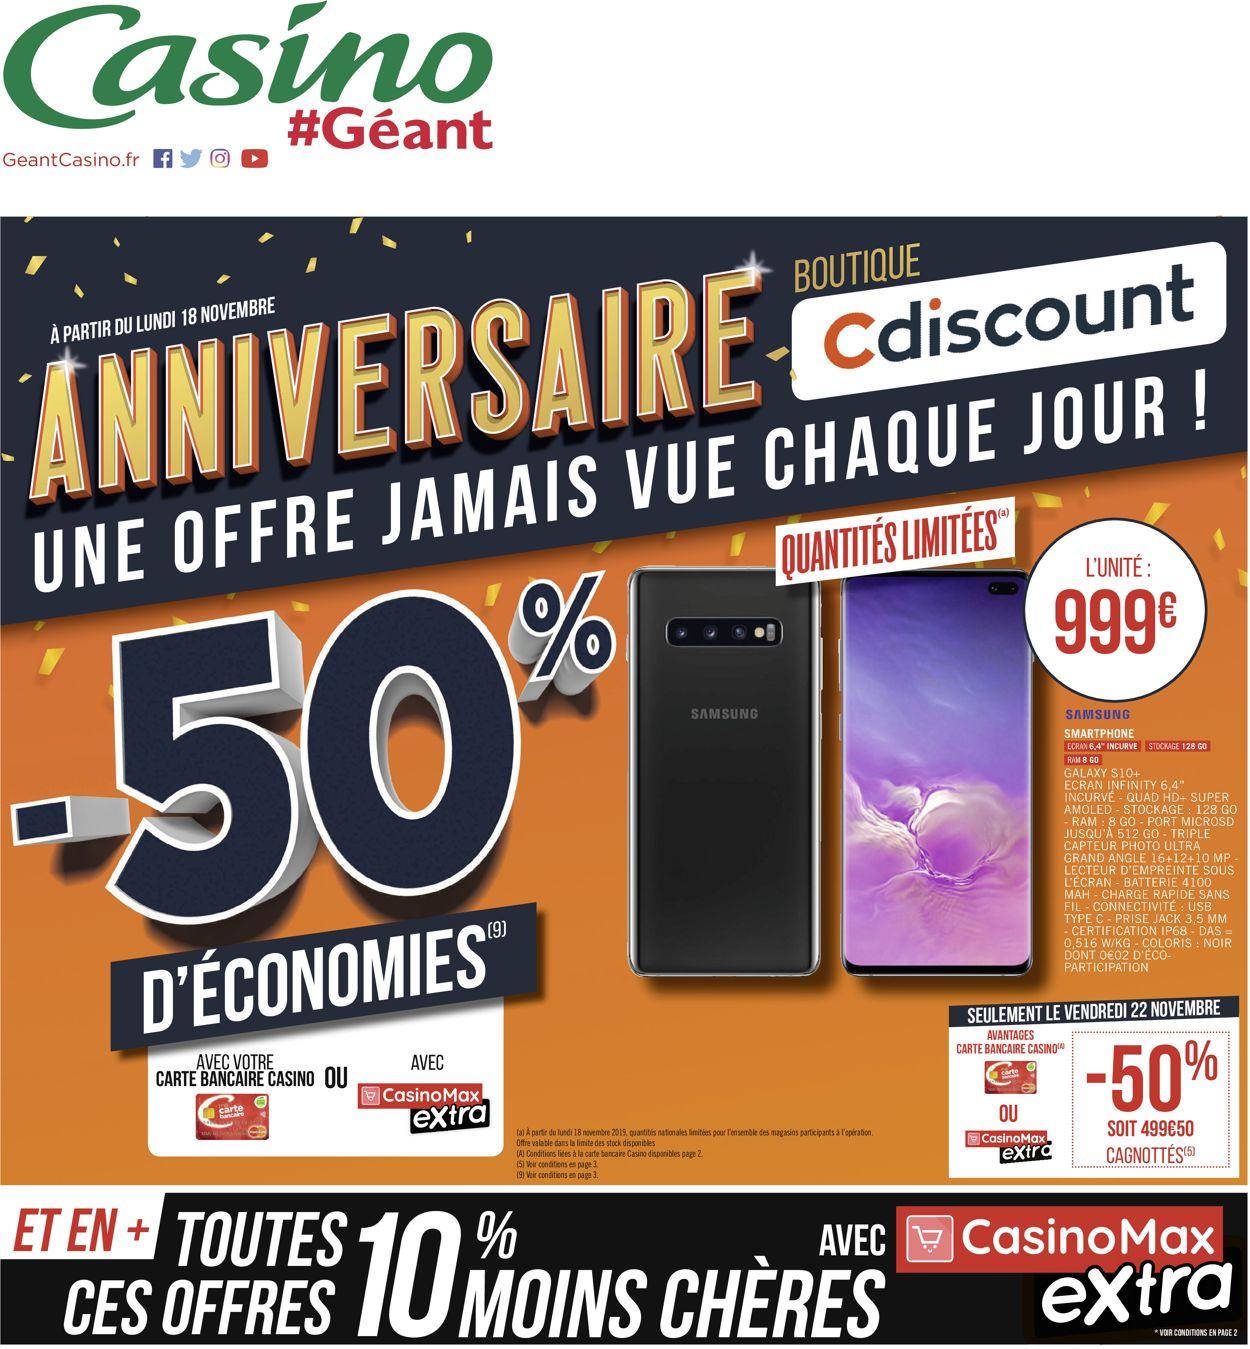 Géant Casino Catalogue - 18.11-24.11.2019